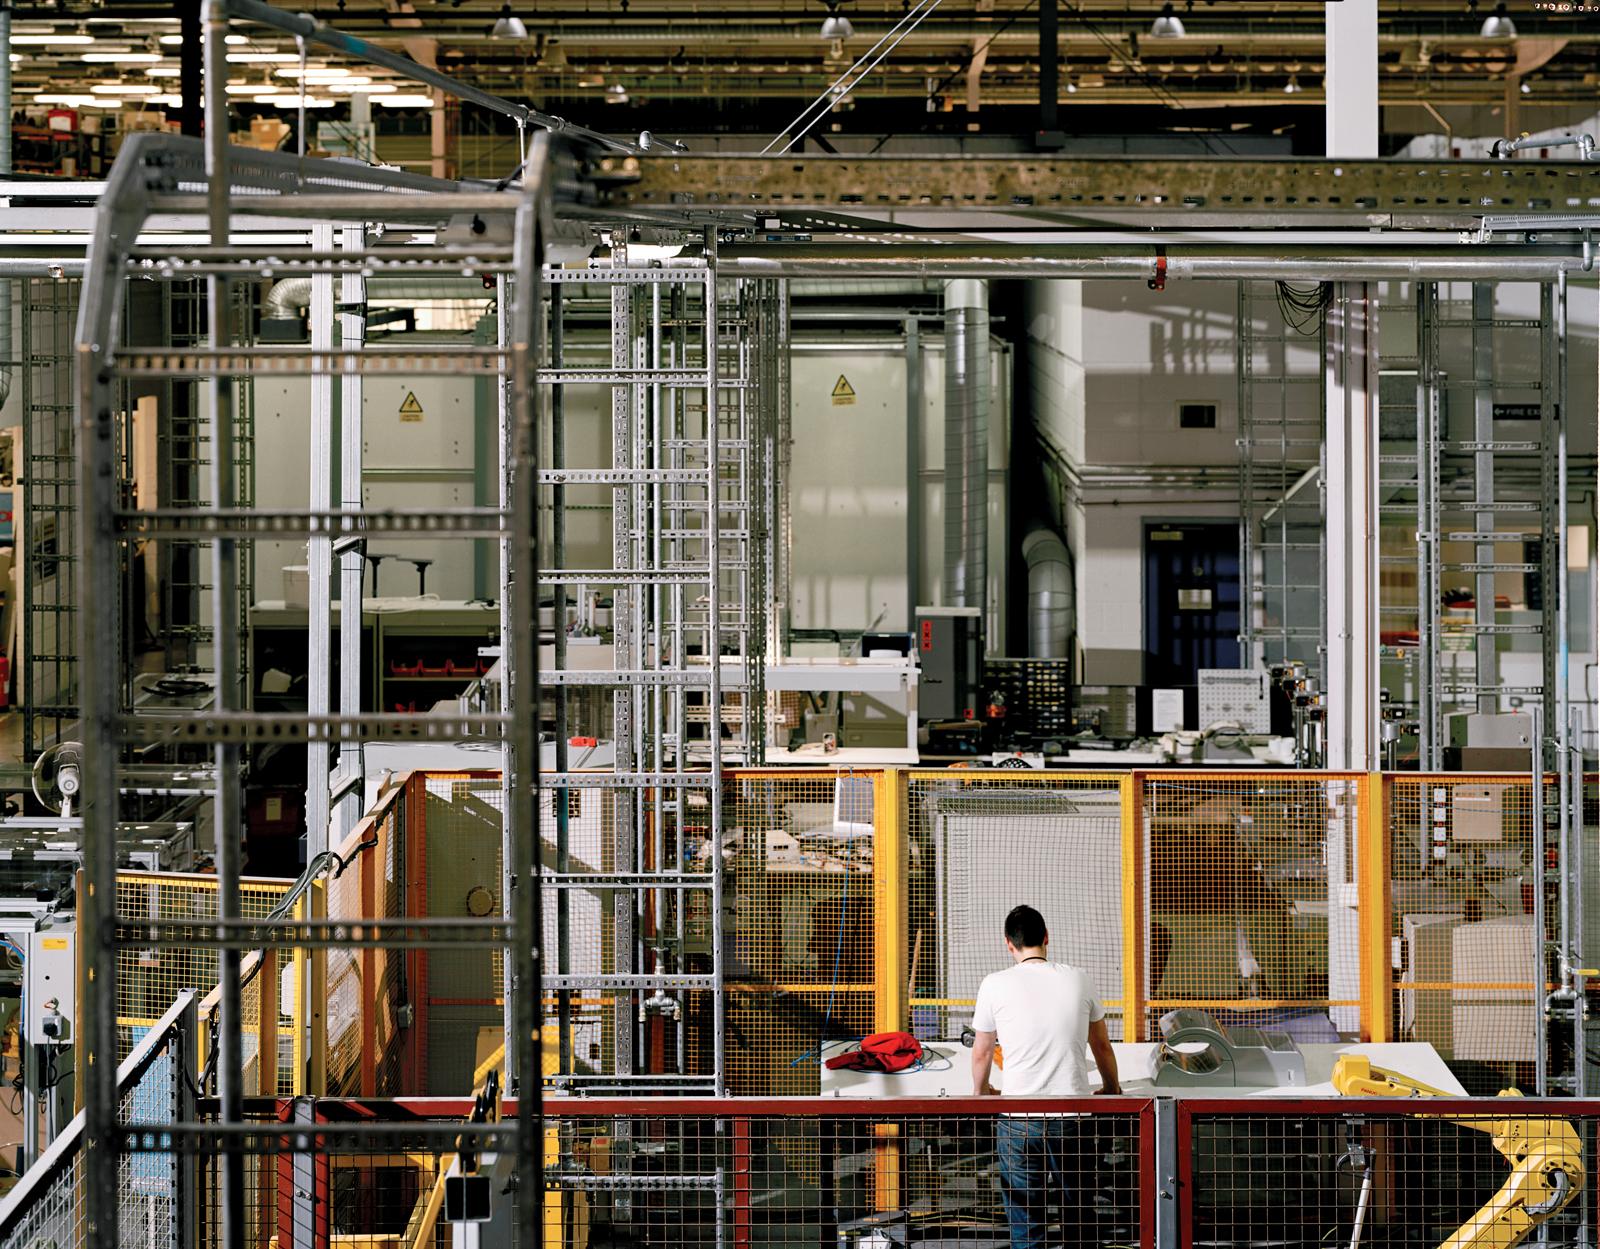 dyson airblade interior